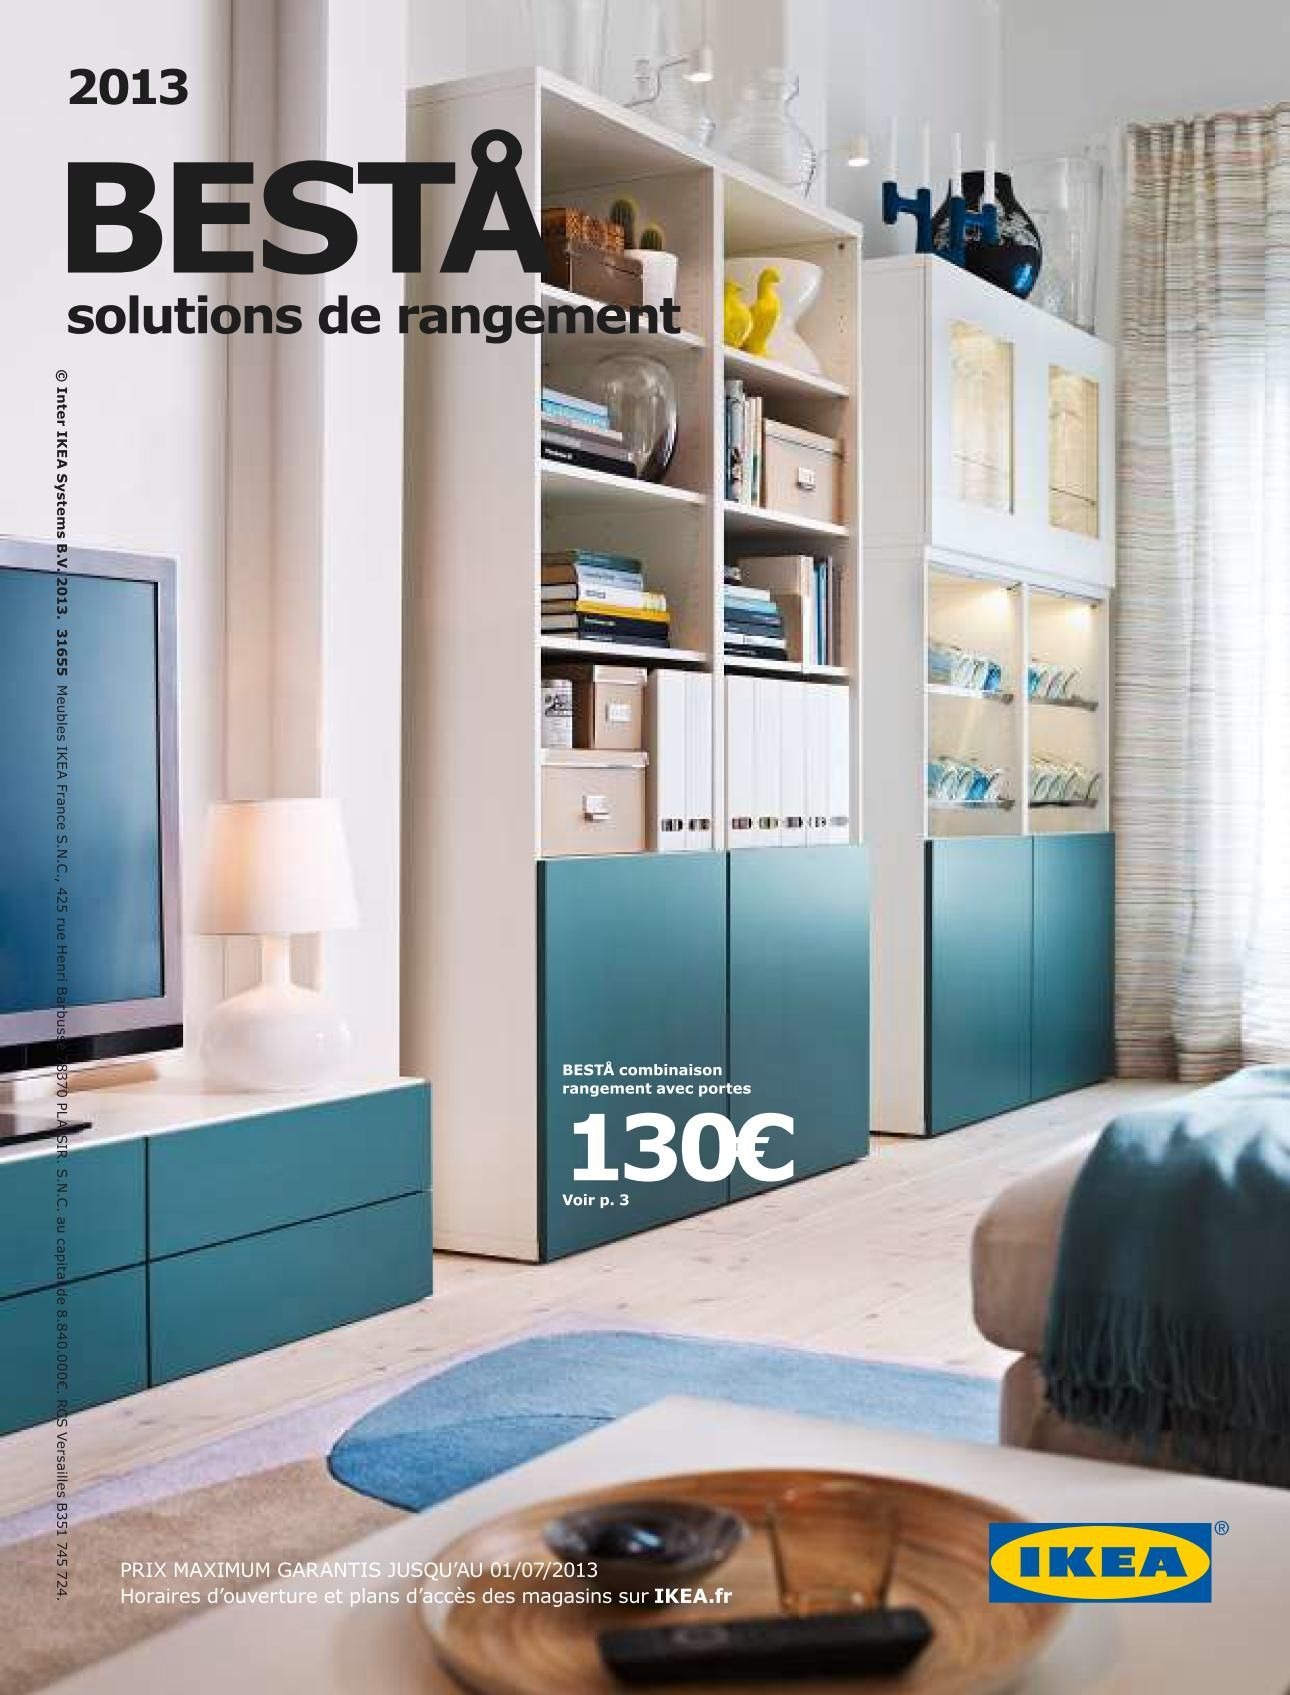 Ikea horaires store venitien bois vacnitien horizontal mm taupe x cm ikea leroy merlin velizy - Horaire ikea cuisine velizy ...